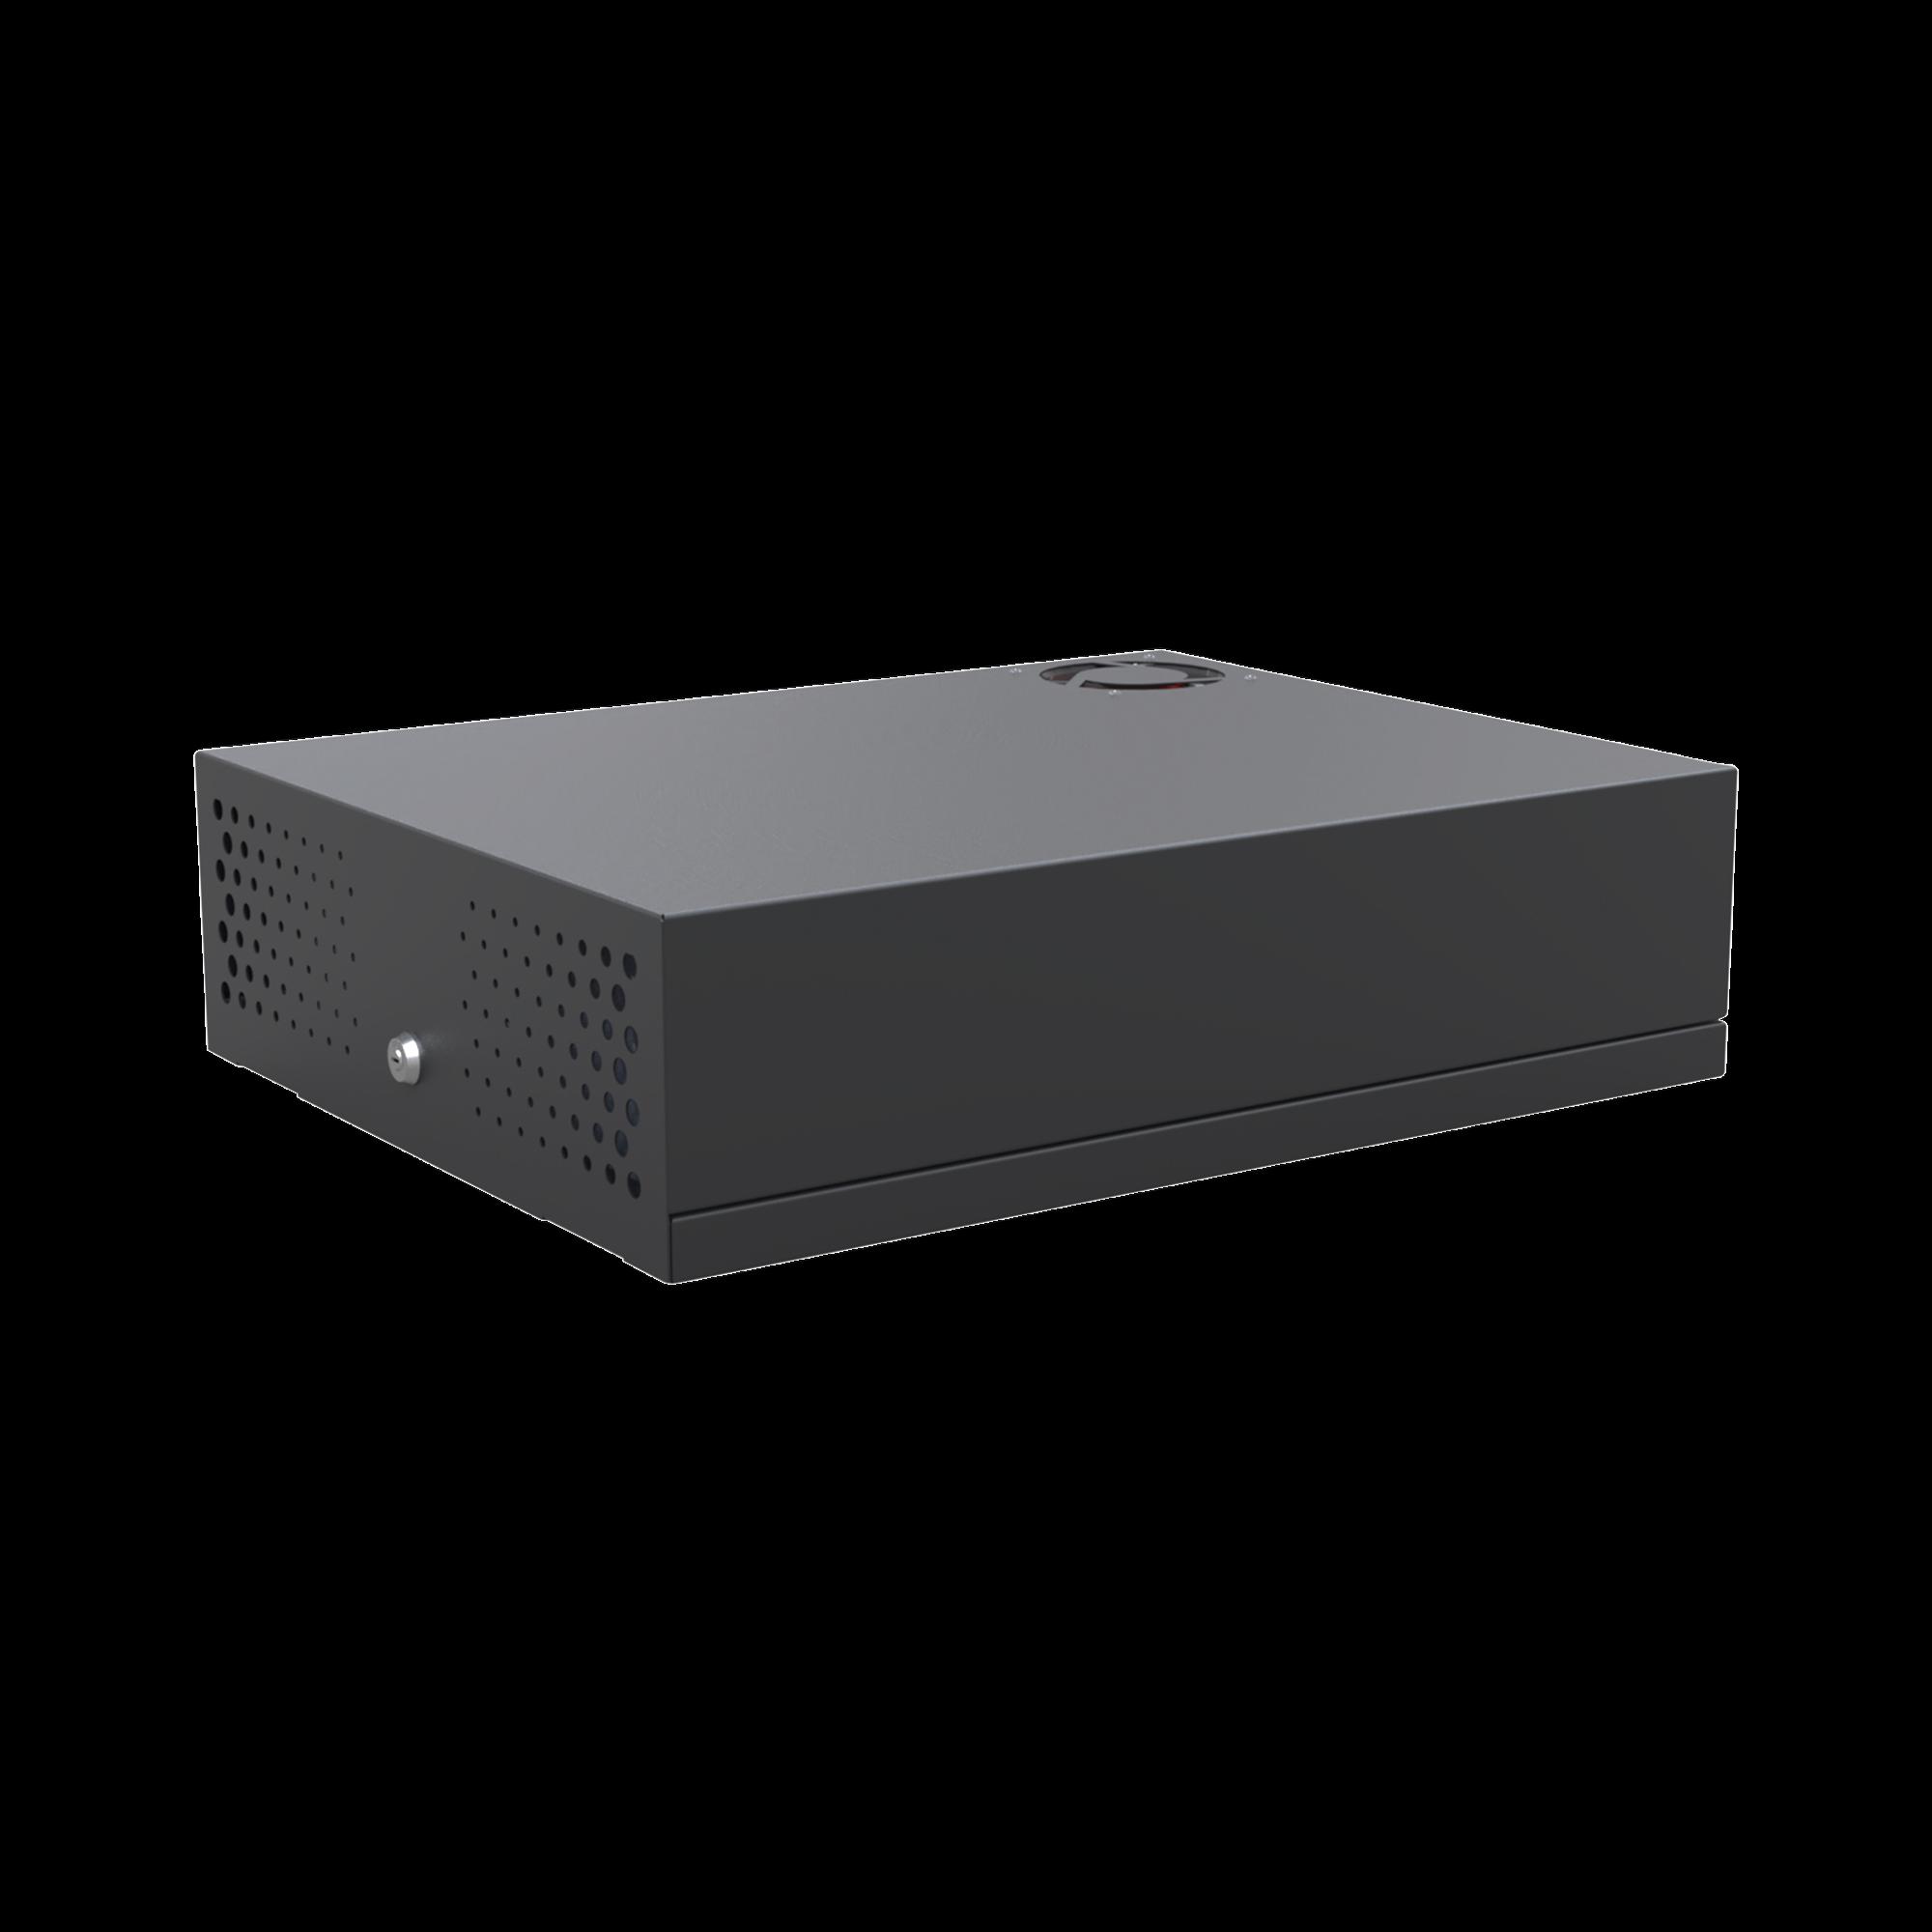 Gabinete Metálico para DVR/NVR